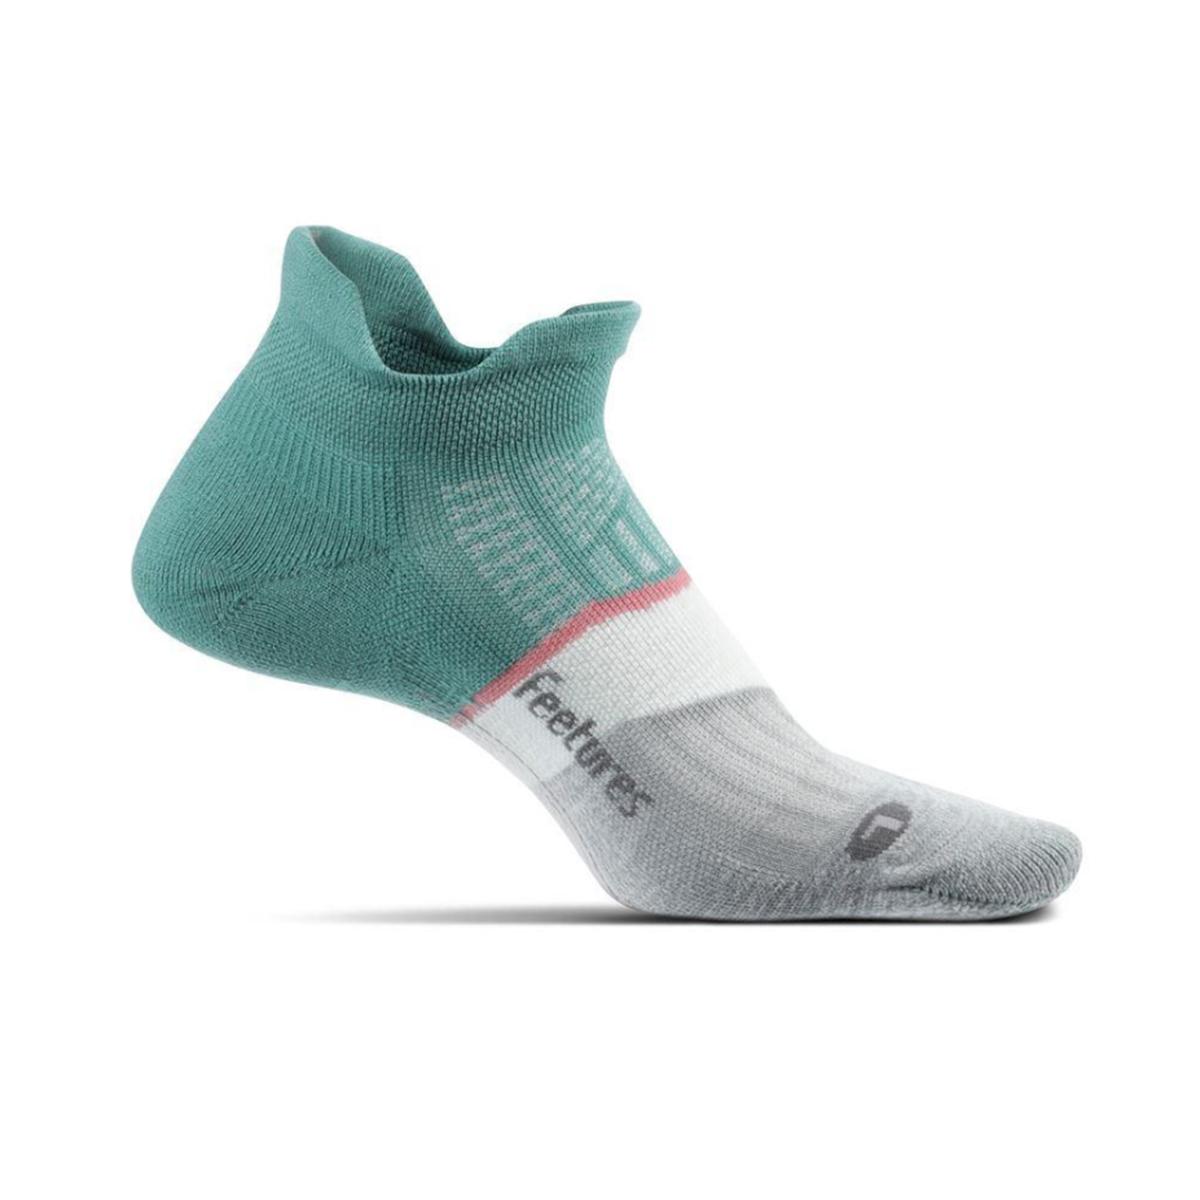 Feetures Elite Light Cushion No Show Tab Socks - Color: Soft Moss - Size: S, Soft Moss, large, image 1